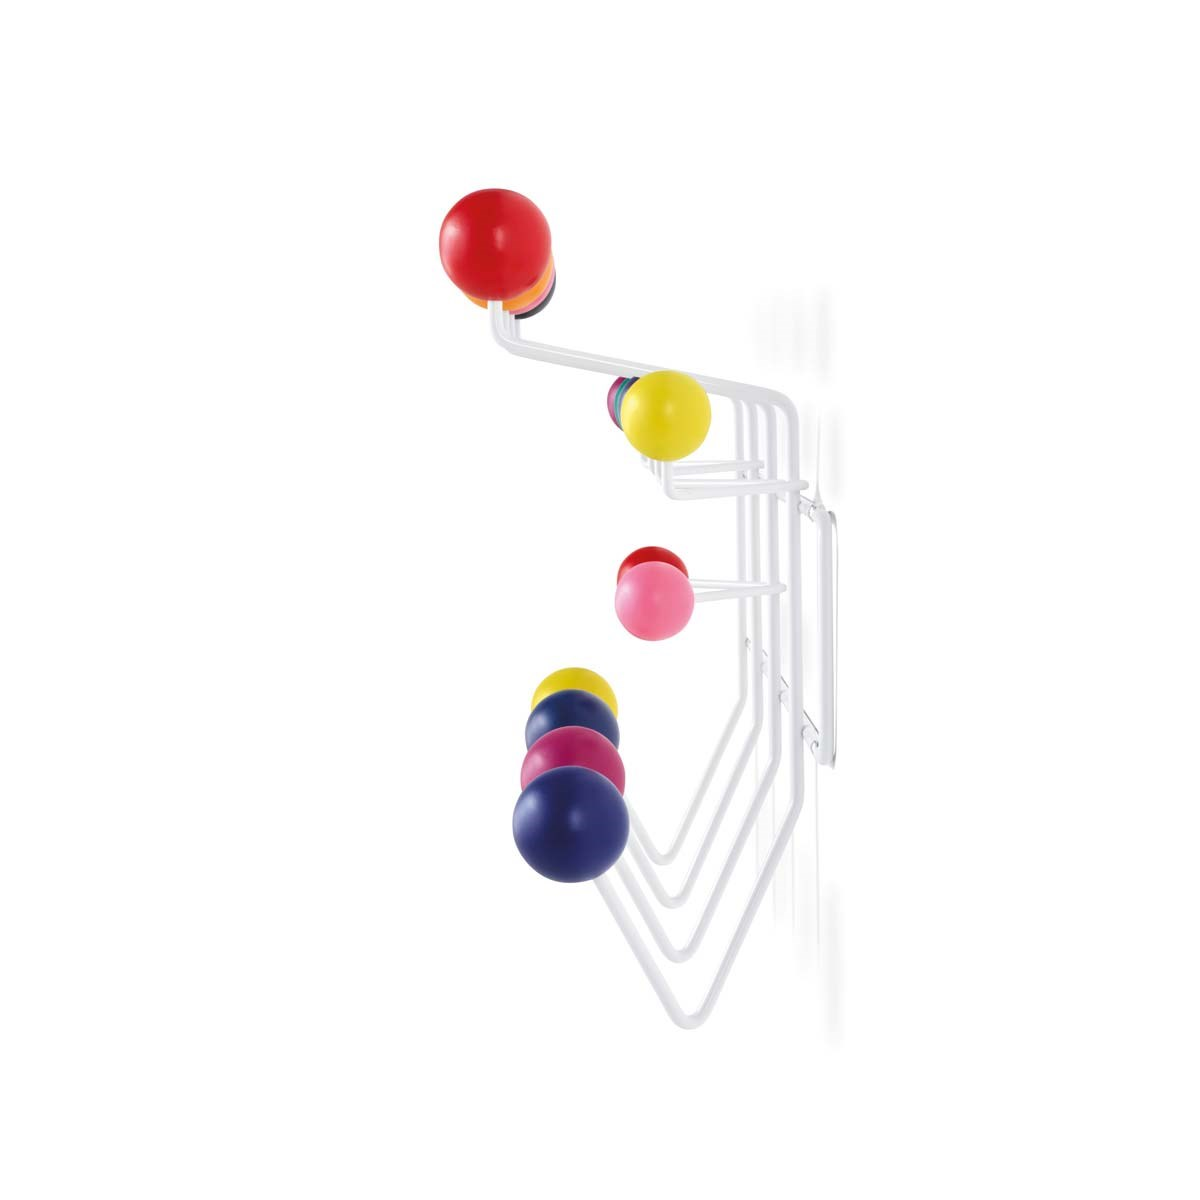 Hermanmiller Eames Hangitall Accessories 7